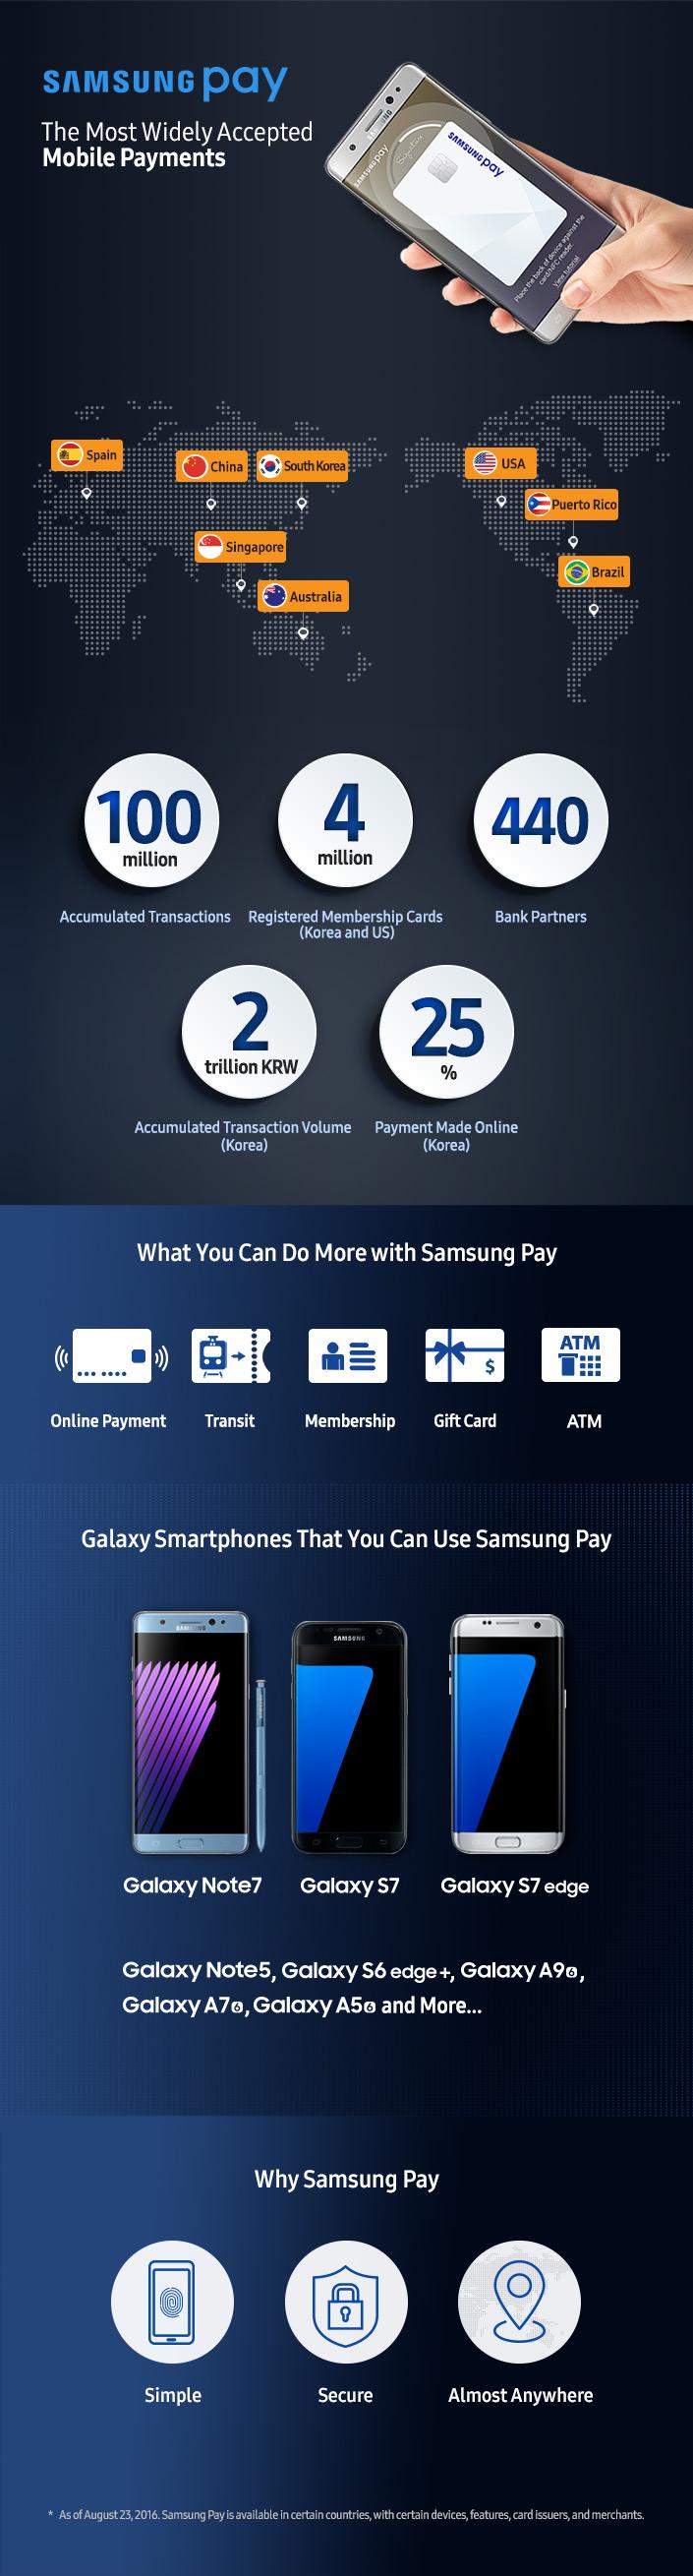 Samsung Pay一周年晒成绩:全球交易笔数接近1亿的照片